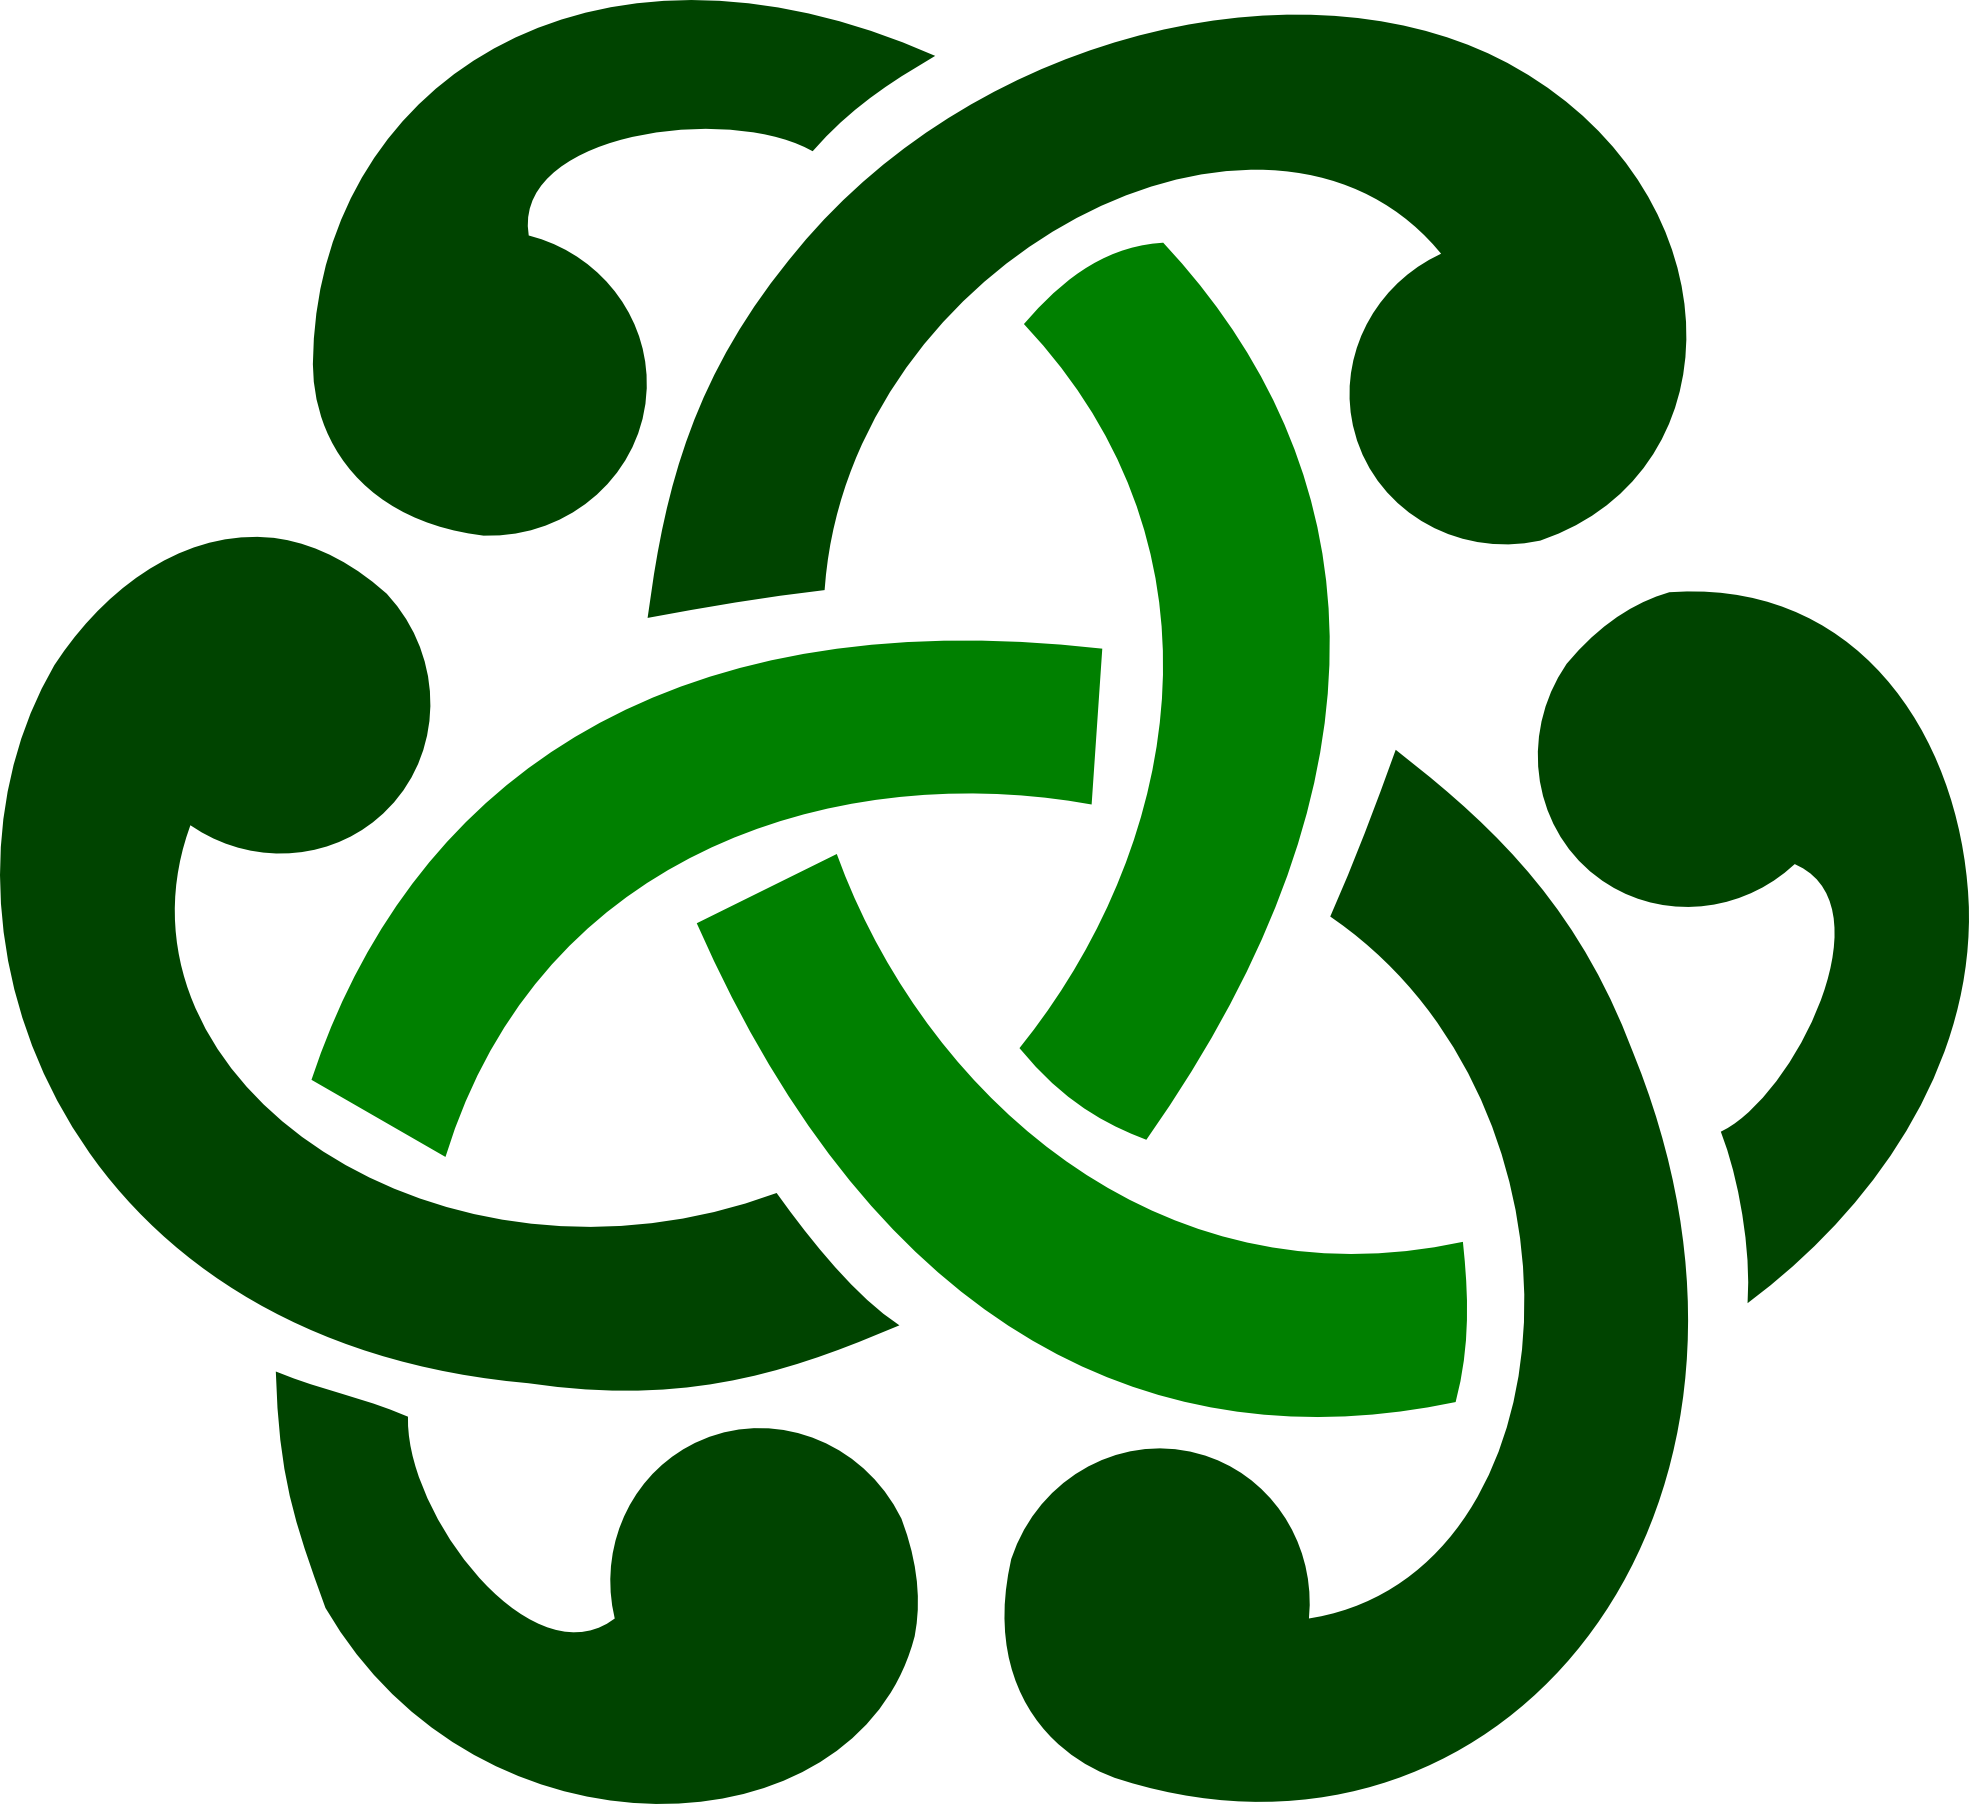 png transparent download For family google search. Celtic clipart celtic symbol.